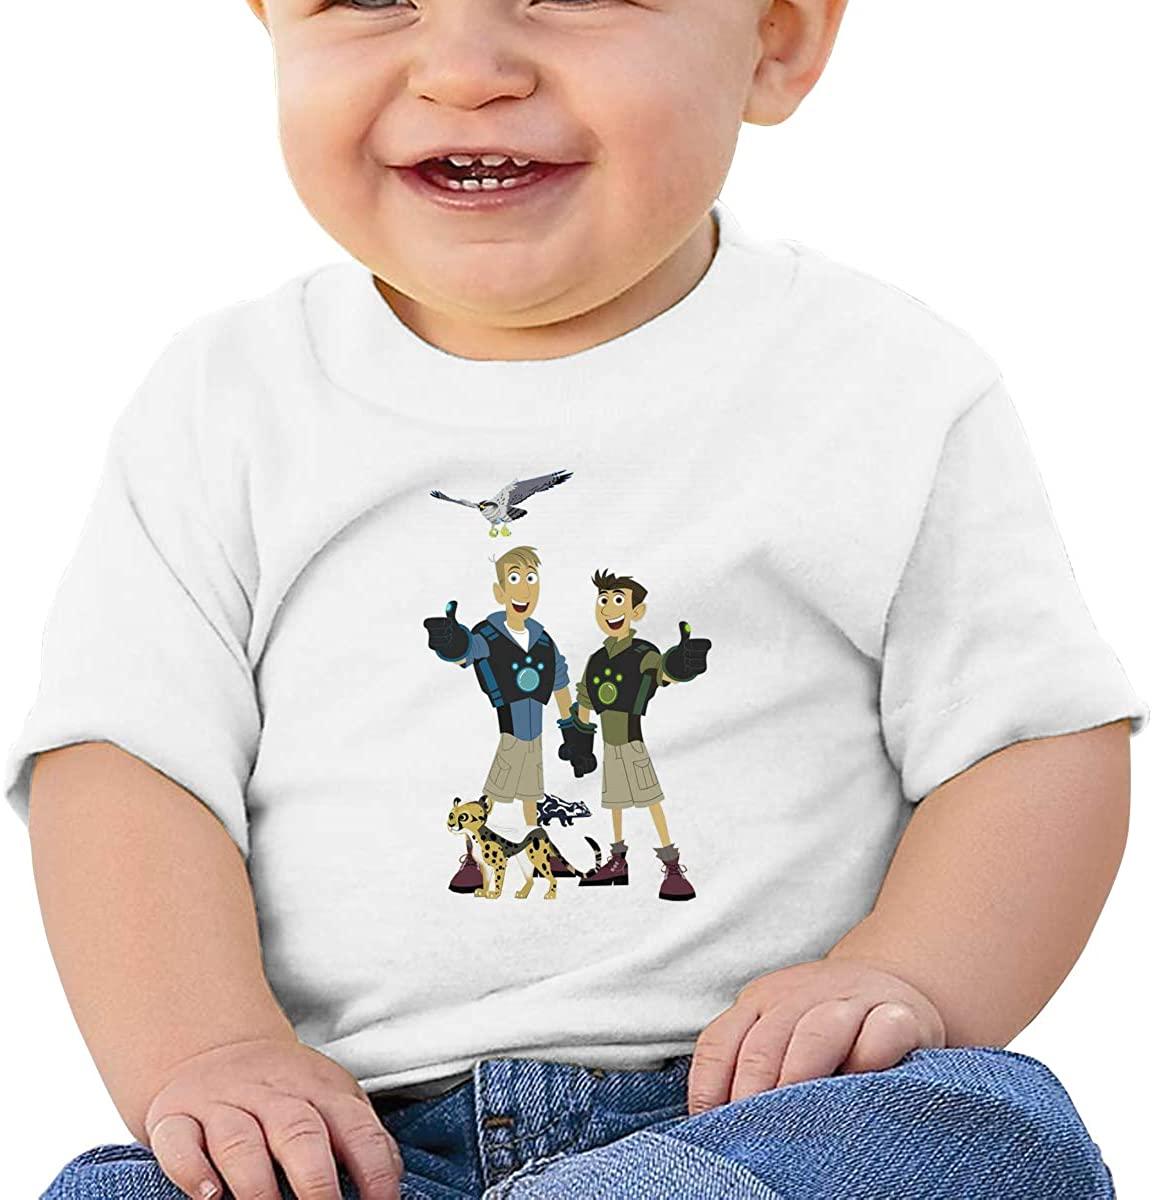 6-24 Months Boy and Girl Baby Short Sleeve T-Shirt Wild Kratts Logo Original Minimalist Style White